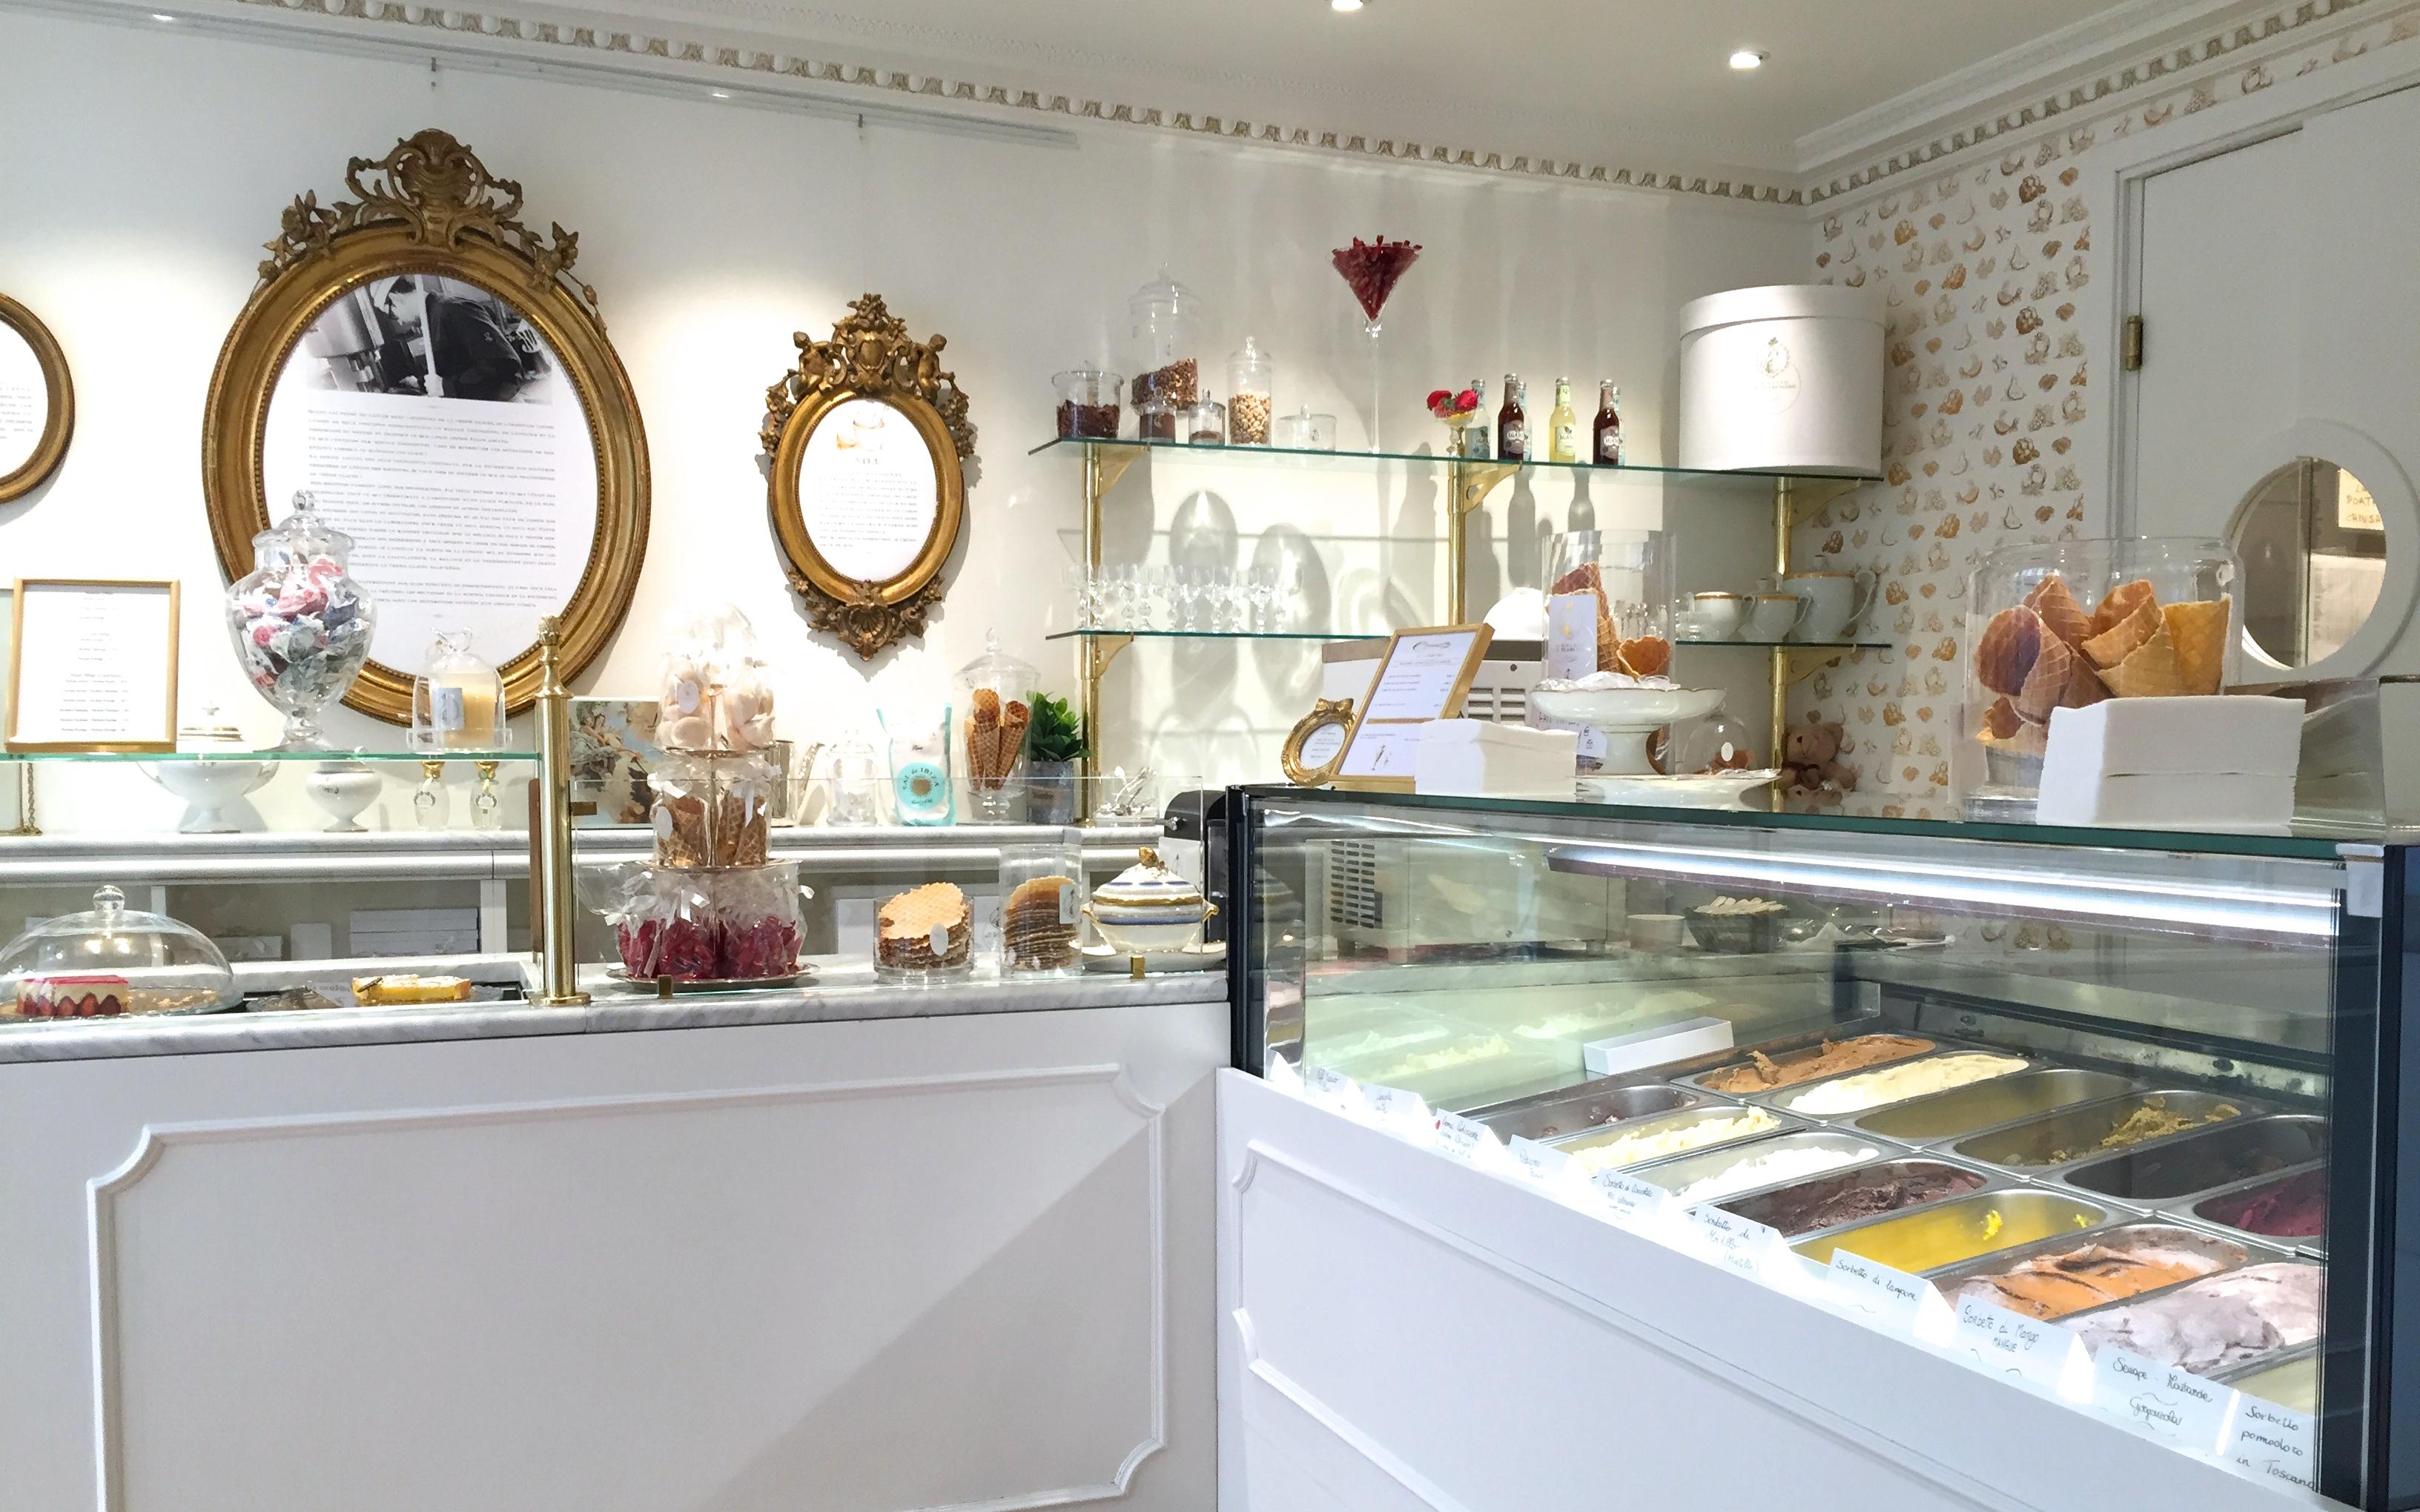 Il gelato del marquese, Paris, Sweet Cabane